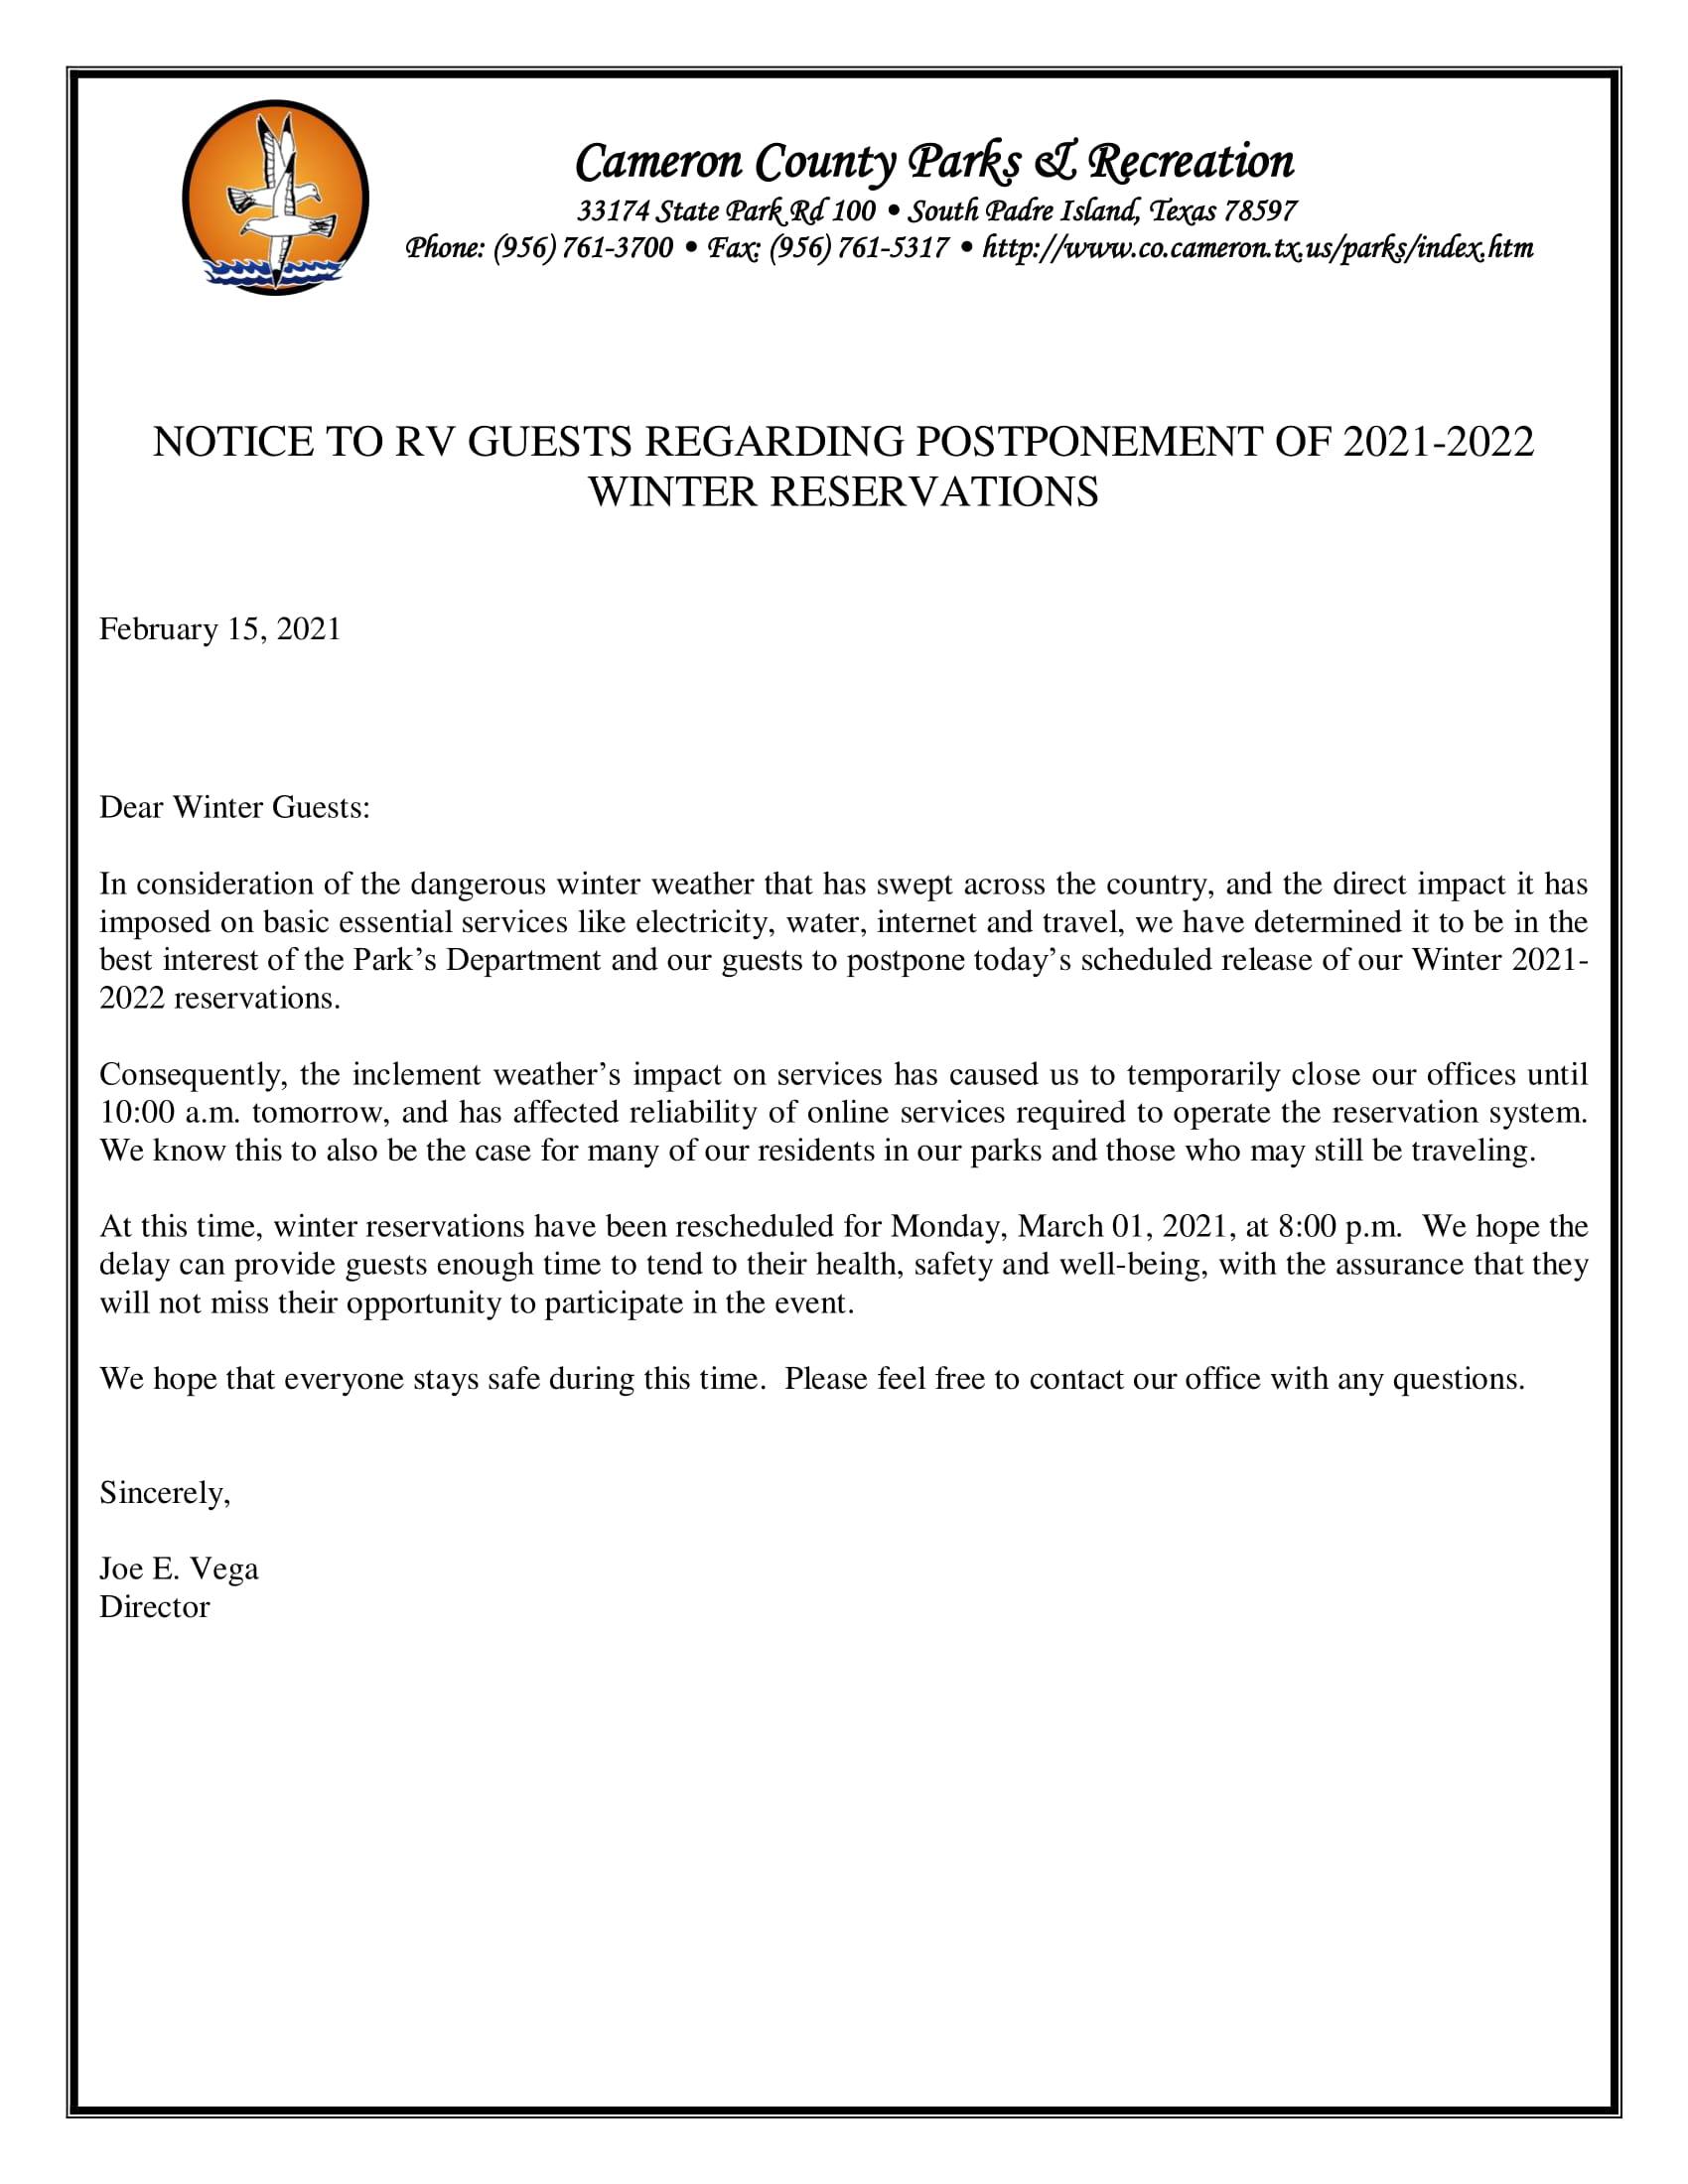 Winter Reservations Postponed